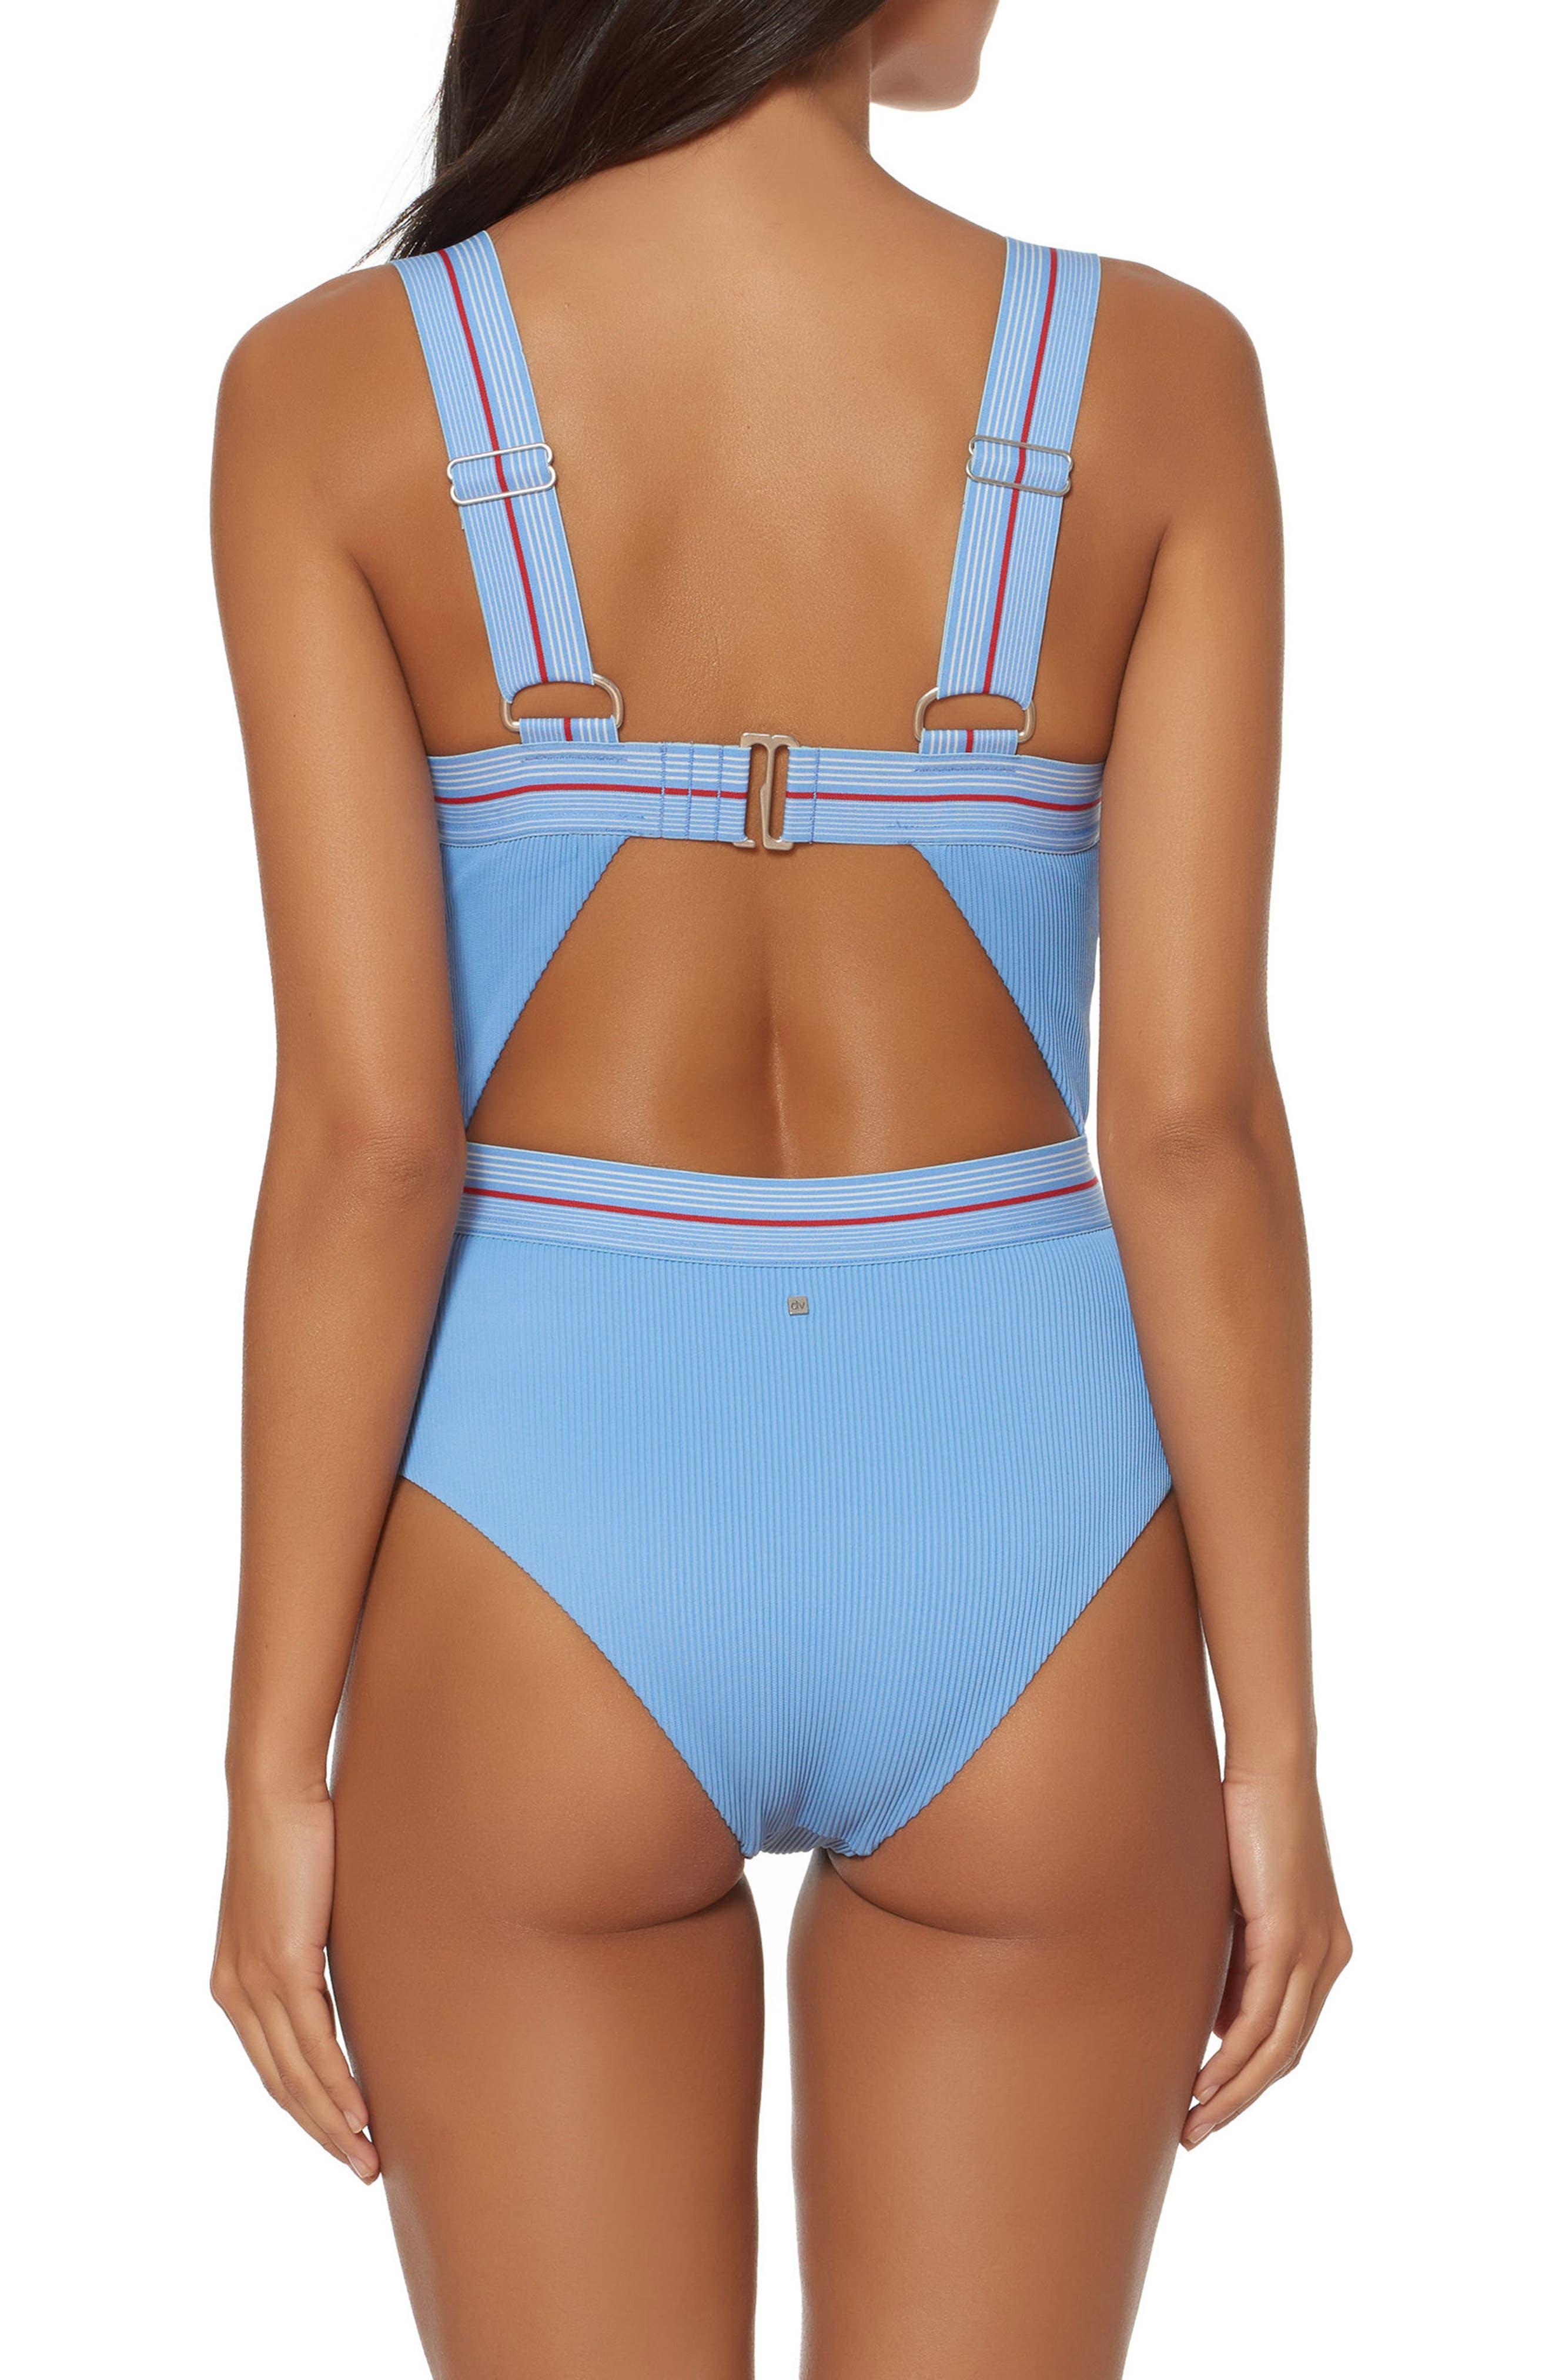 Bondi Beach One-Piece Swimsuit,                             Alternate thumbnail 2, color,                             452